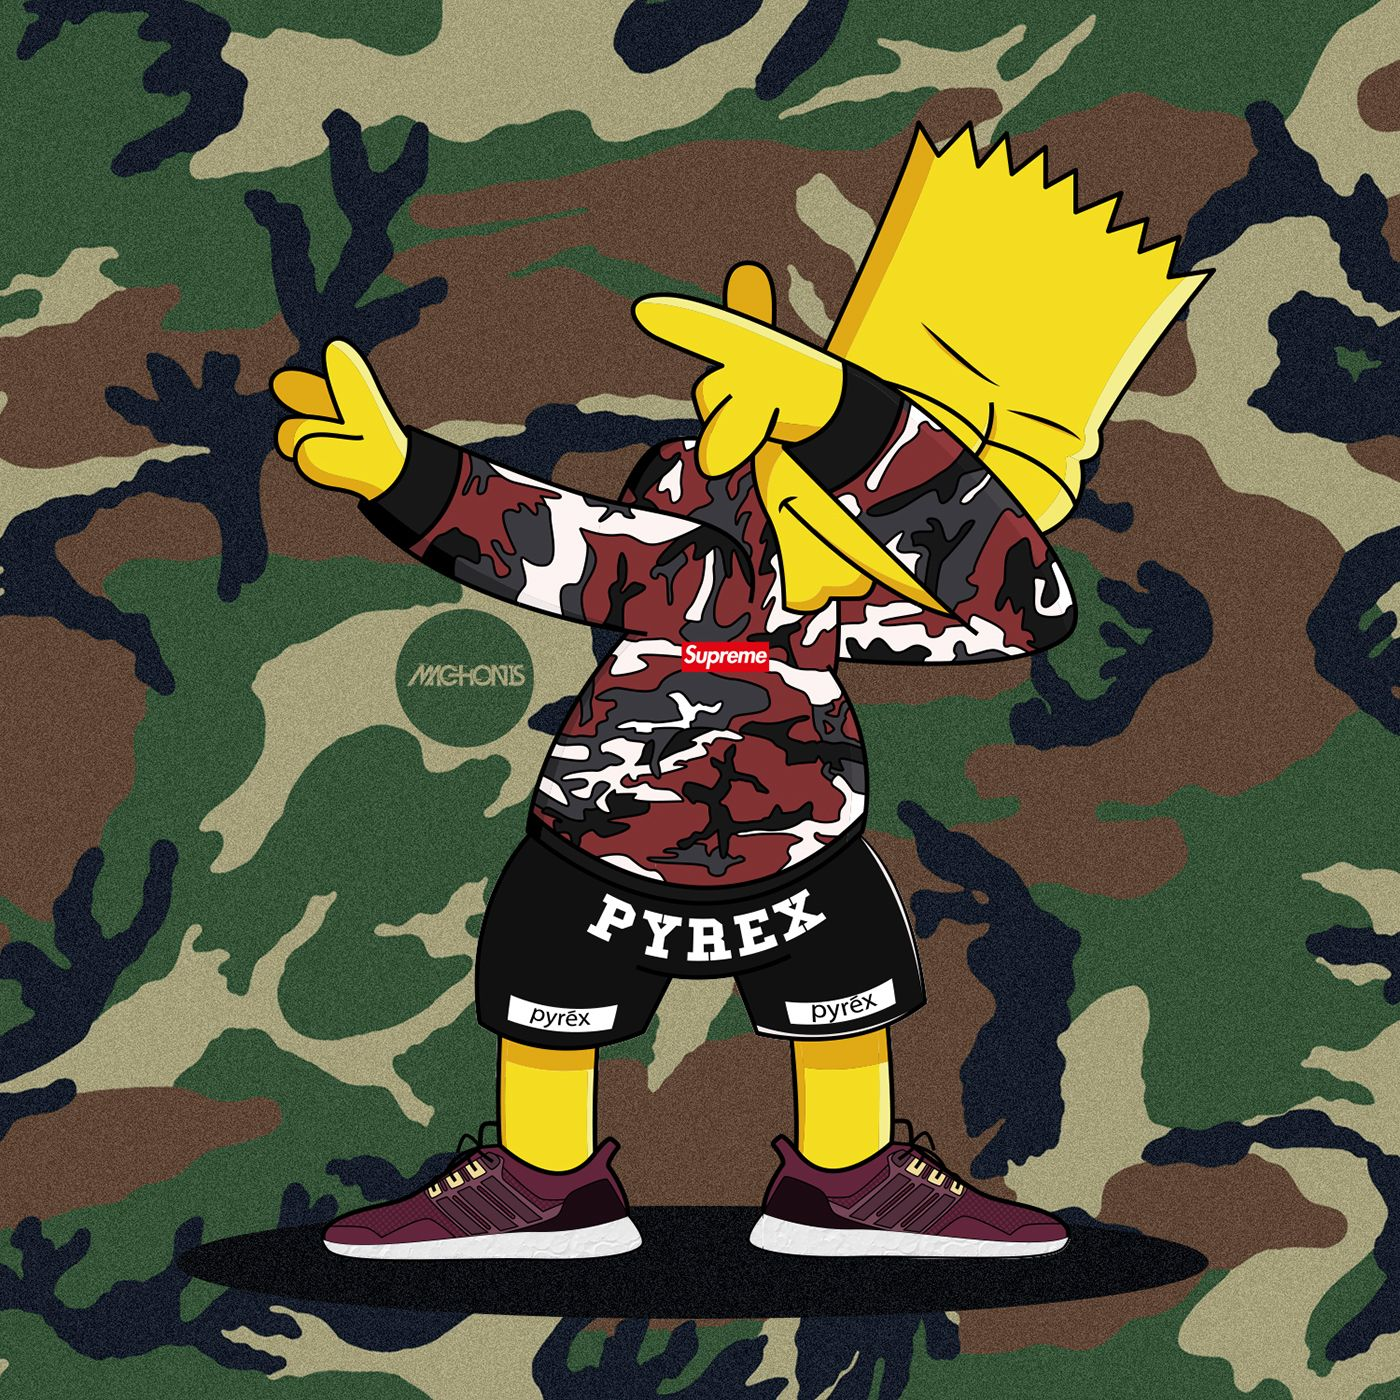 Supreme The Simpsons: Dabbin' Bart Simpson Supreme Adidas Ultra Boost On Behance